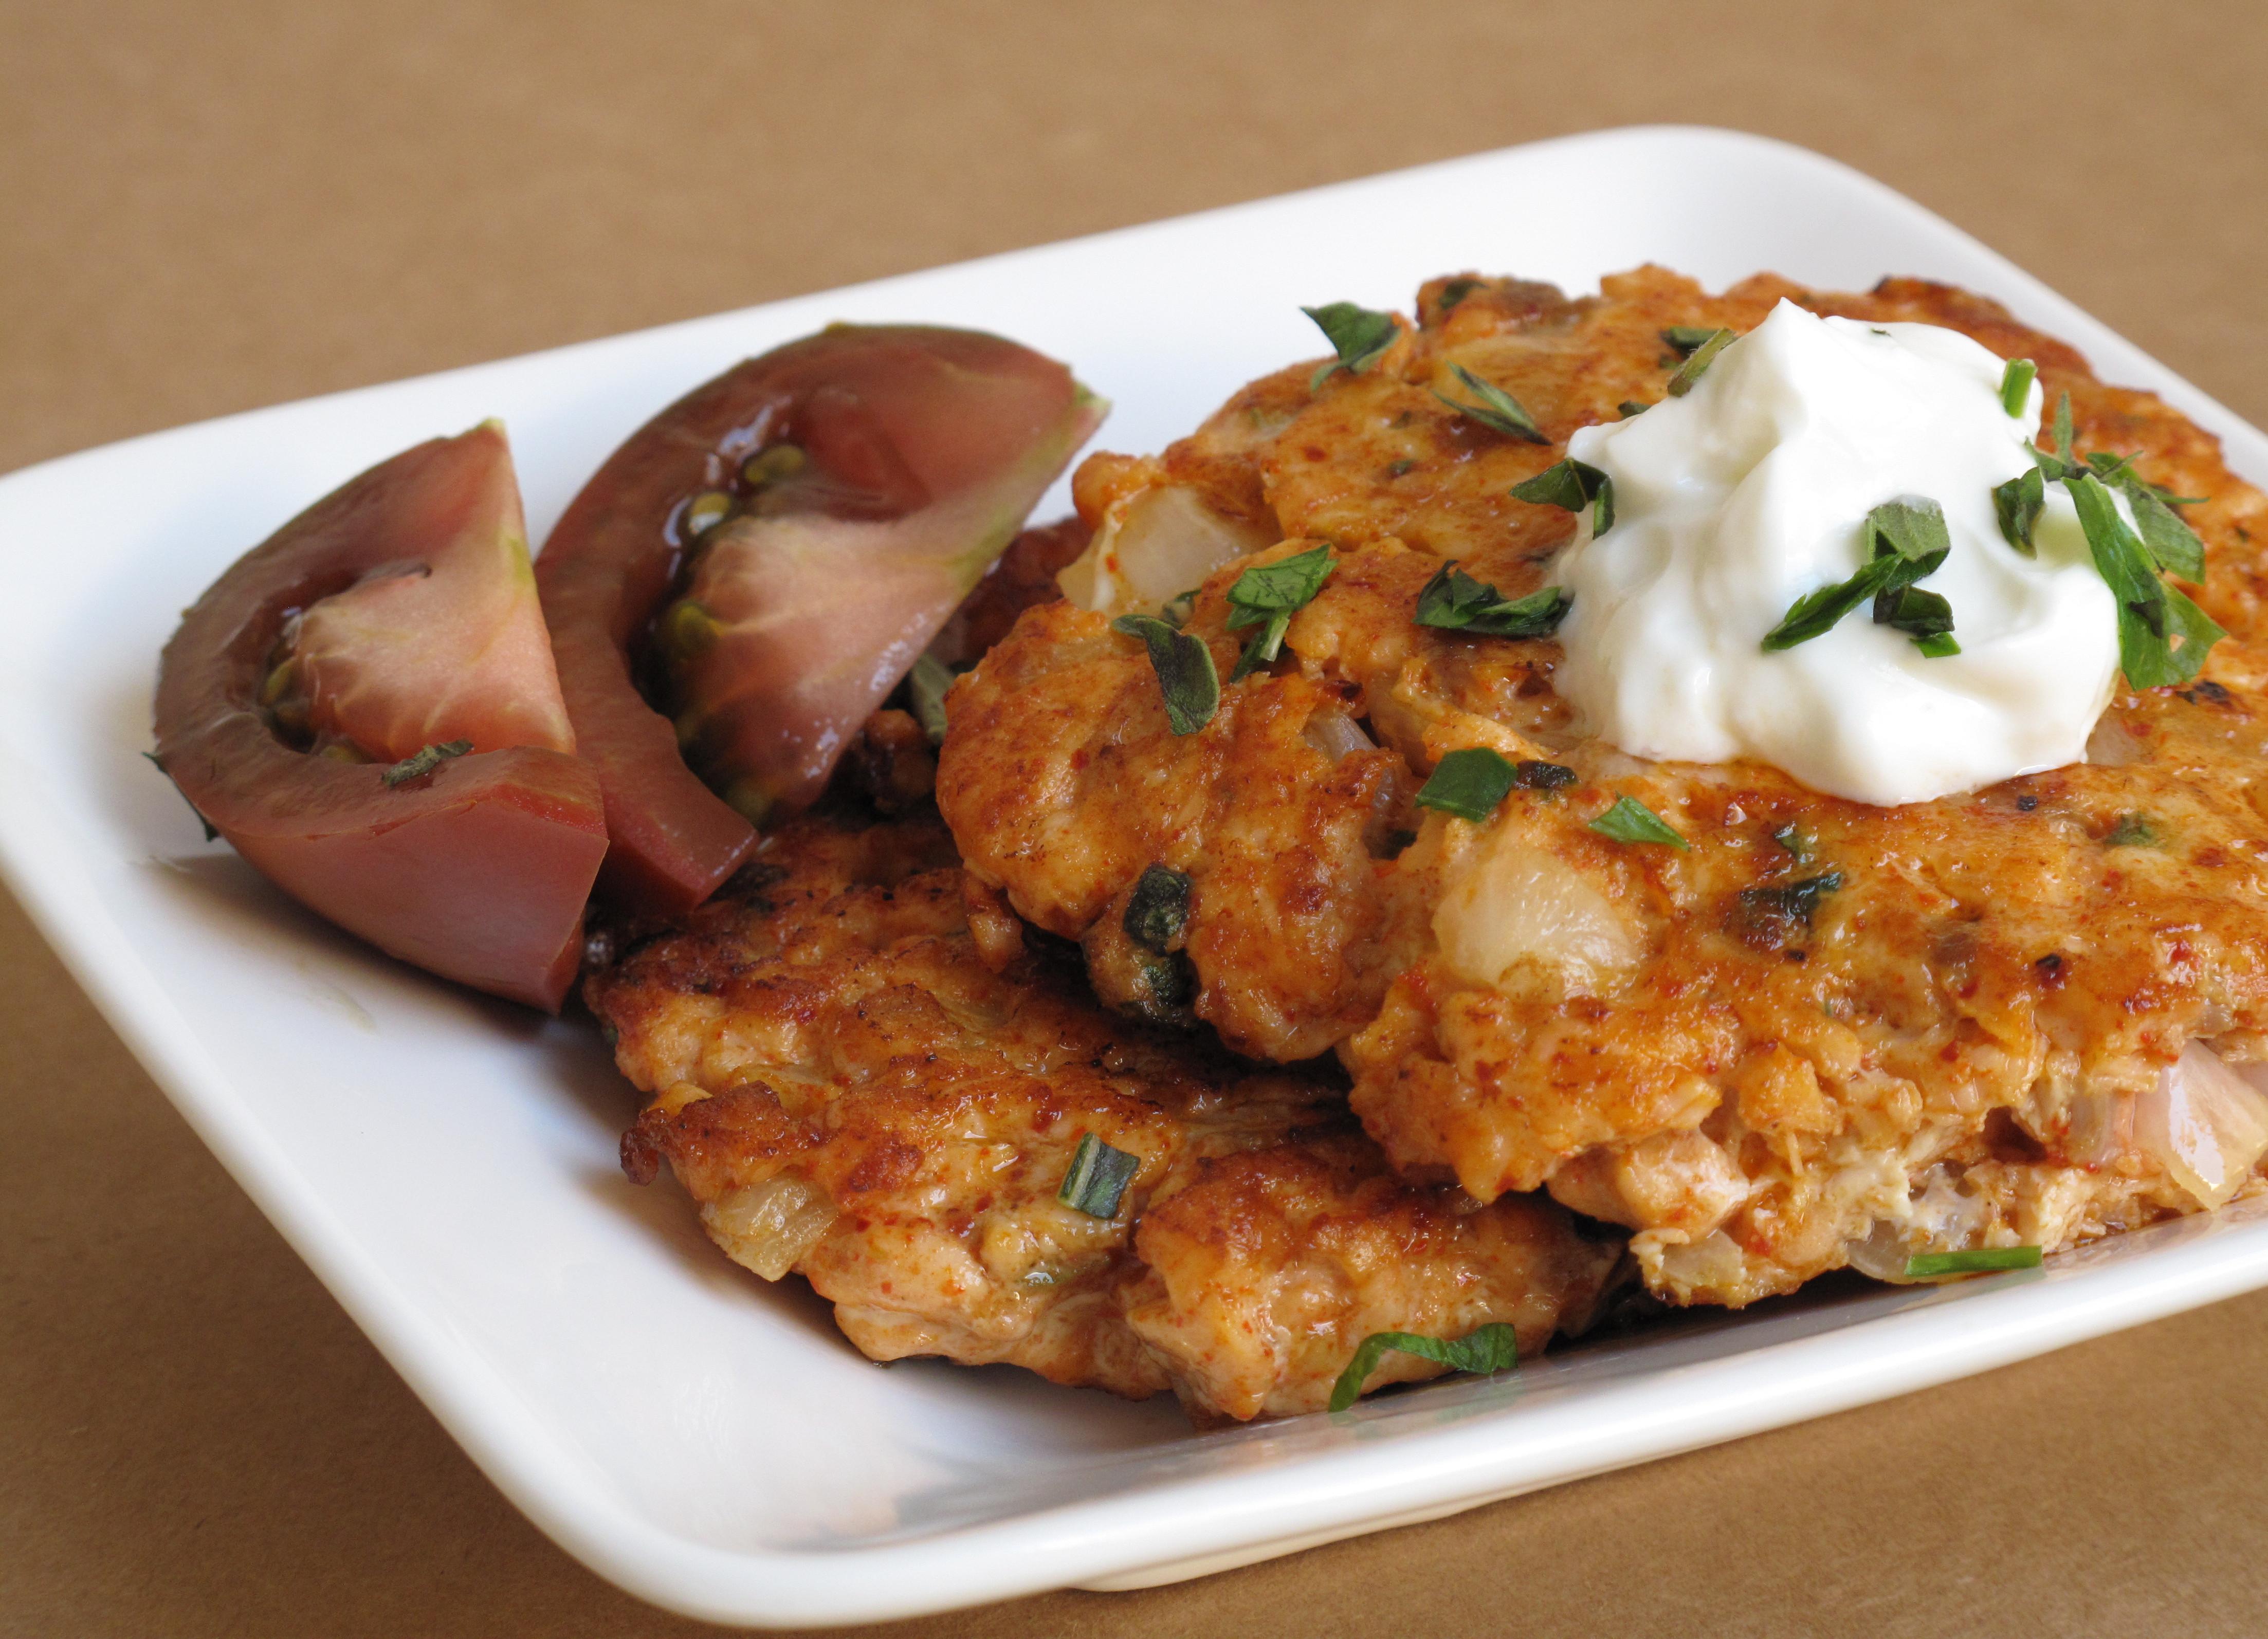 Breakfast Sausage Recipe  Healthy Spa Recipe For Breakfast Salmon Sausage Patties